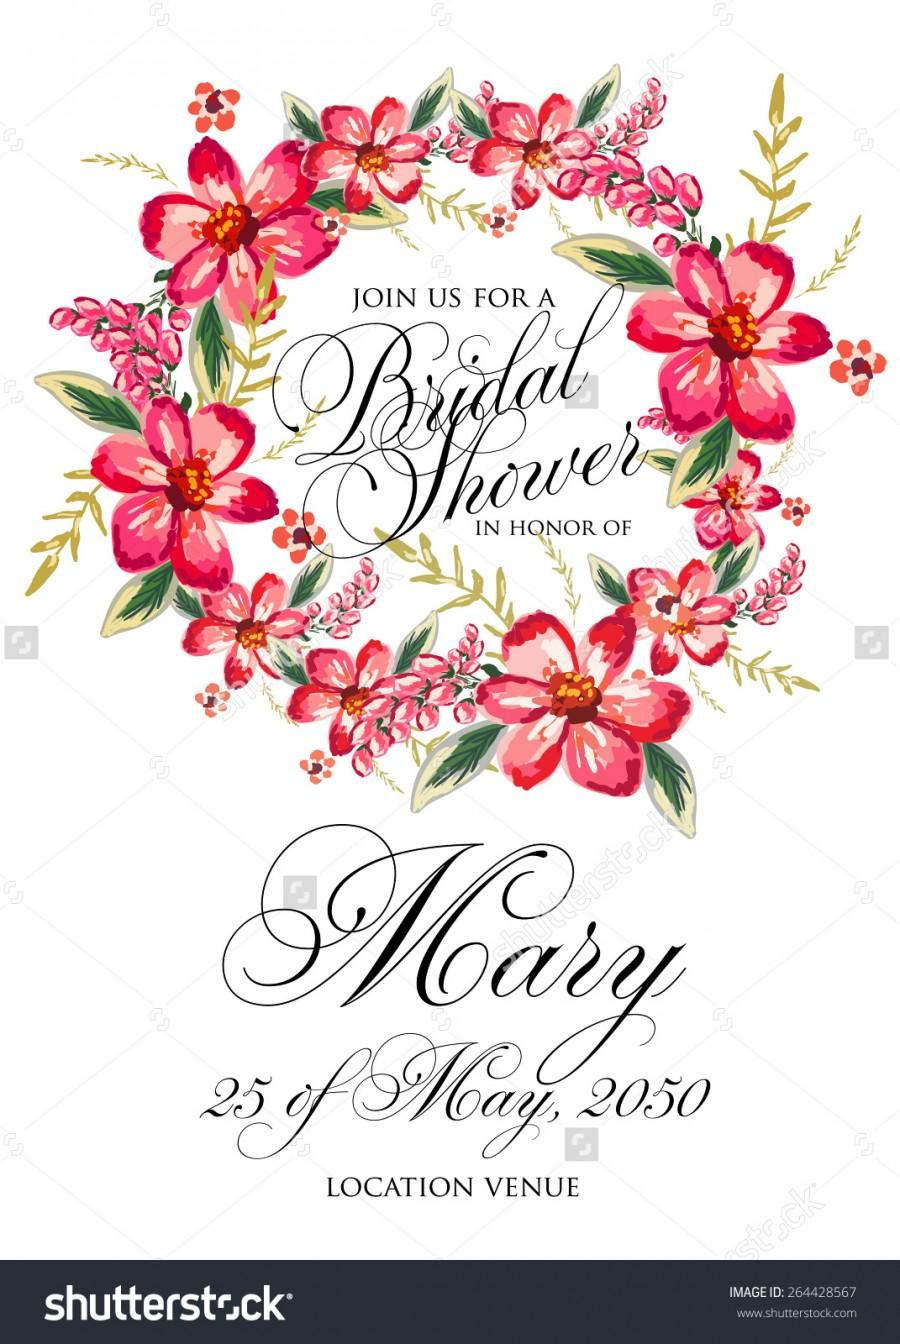 Wedding - Wedding invitation